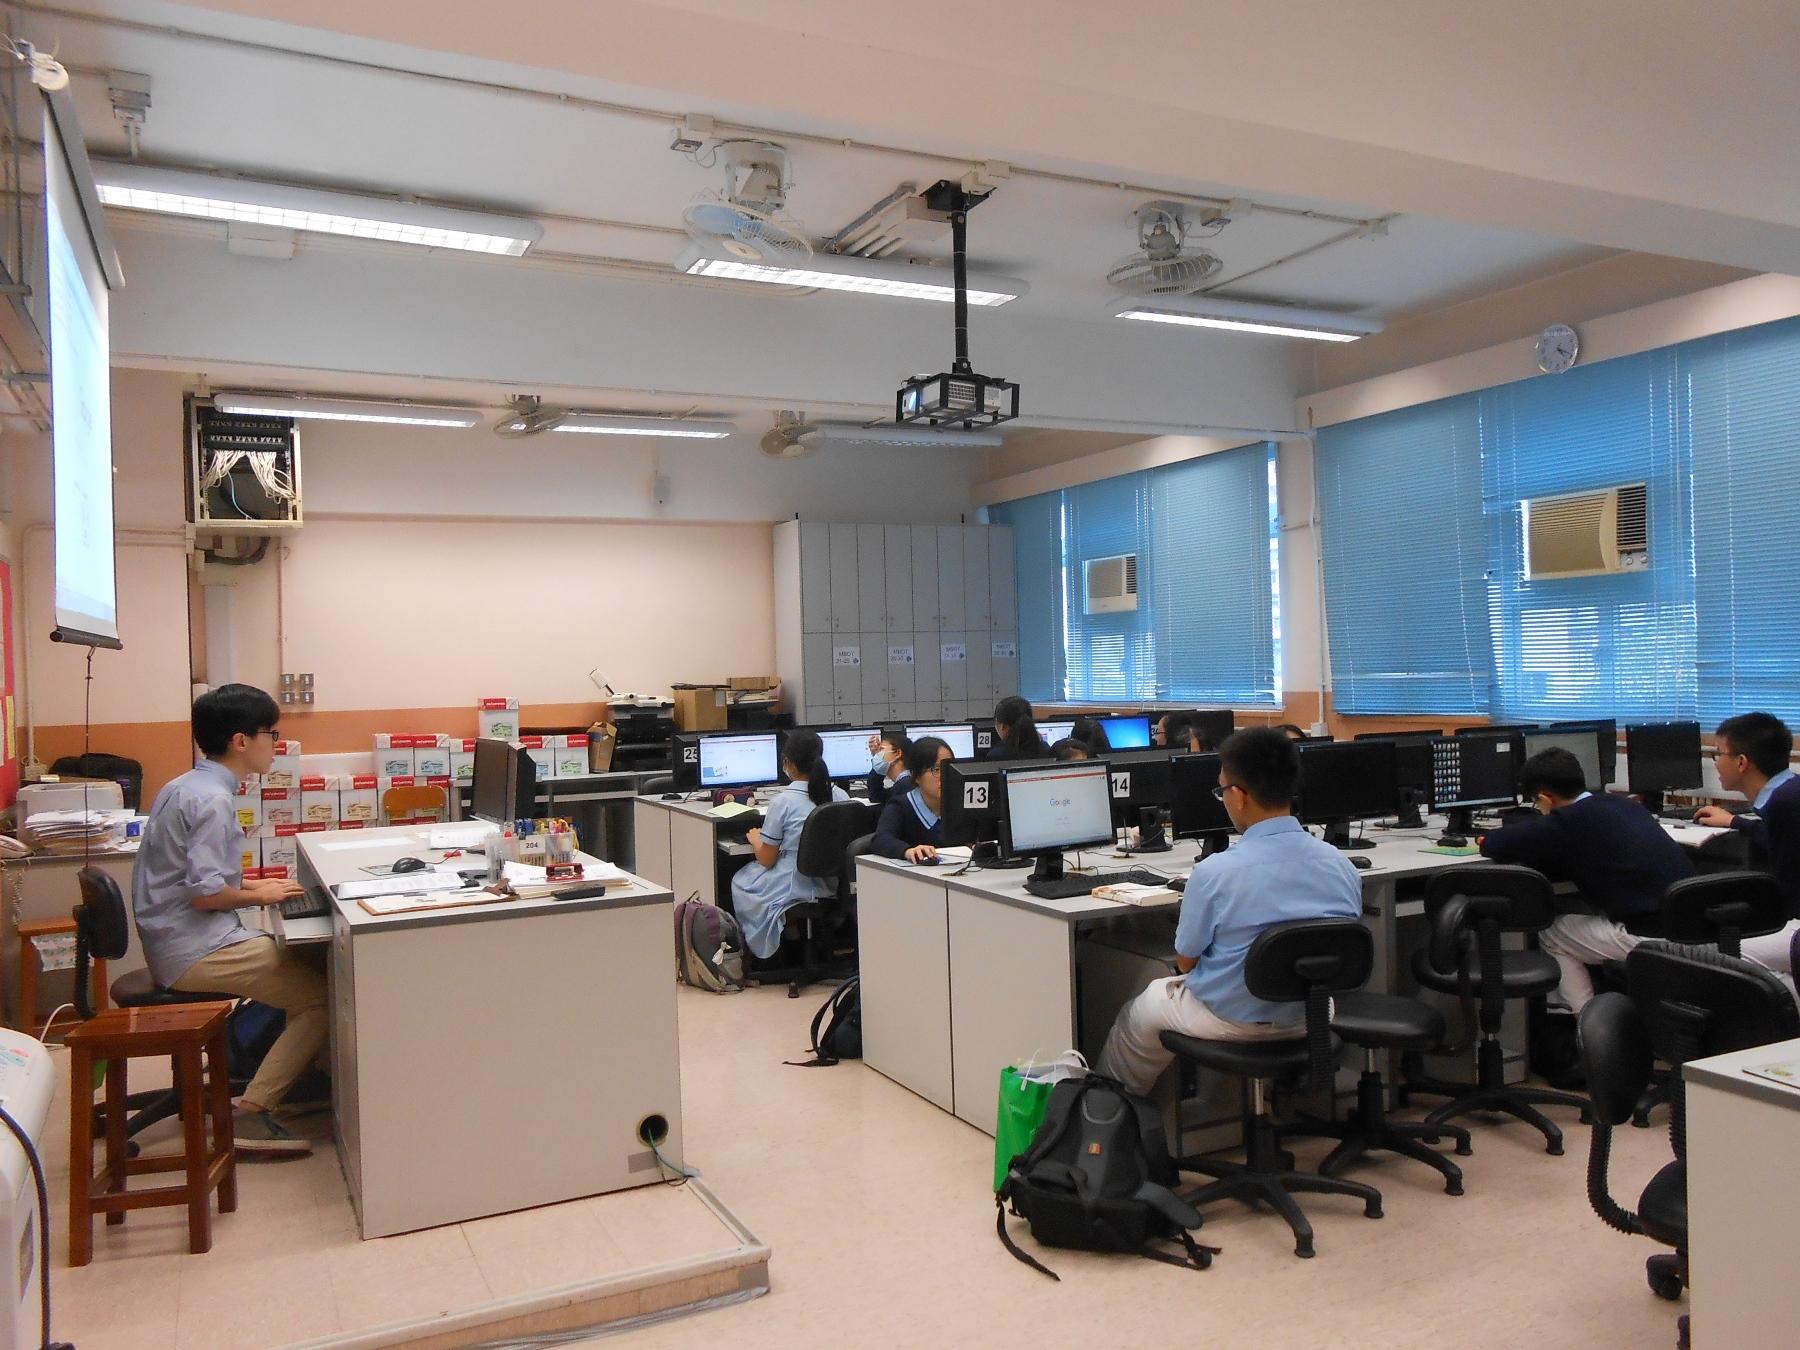 http://npc.edu.hk/sites/default/files/dscn0125.jpg